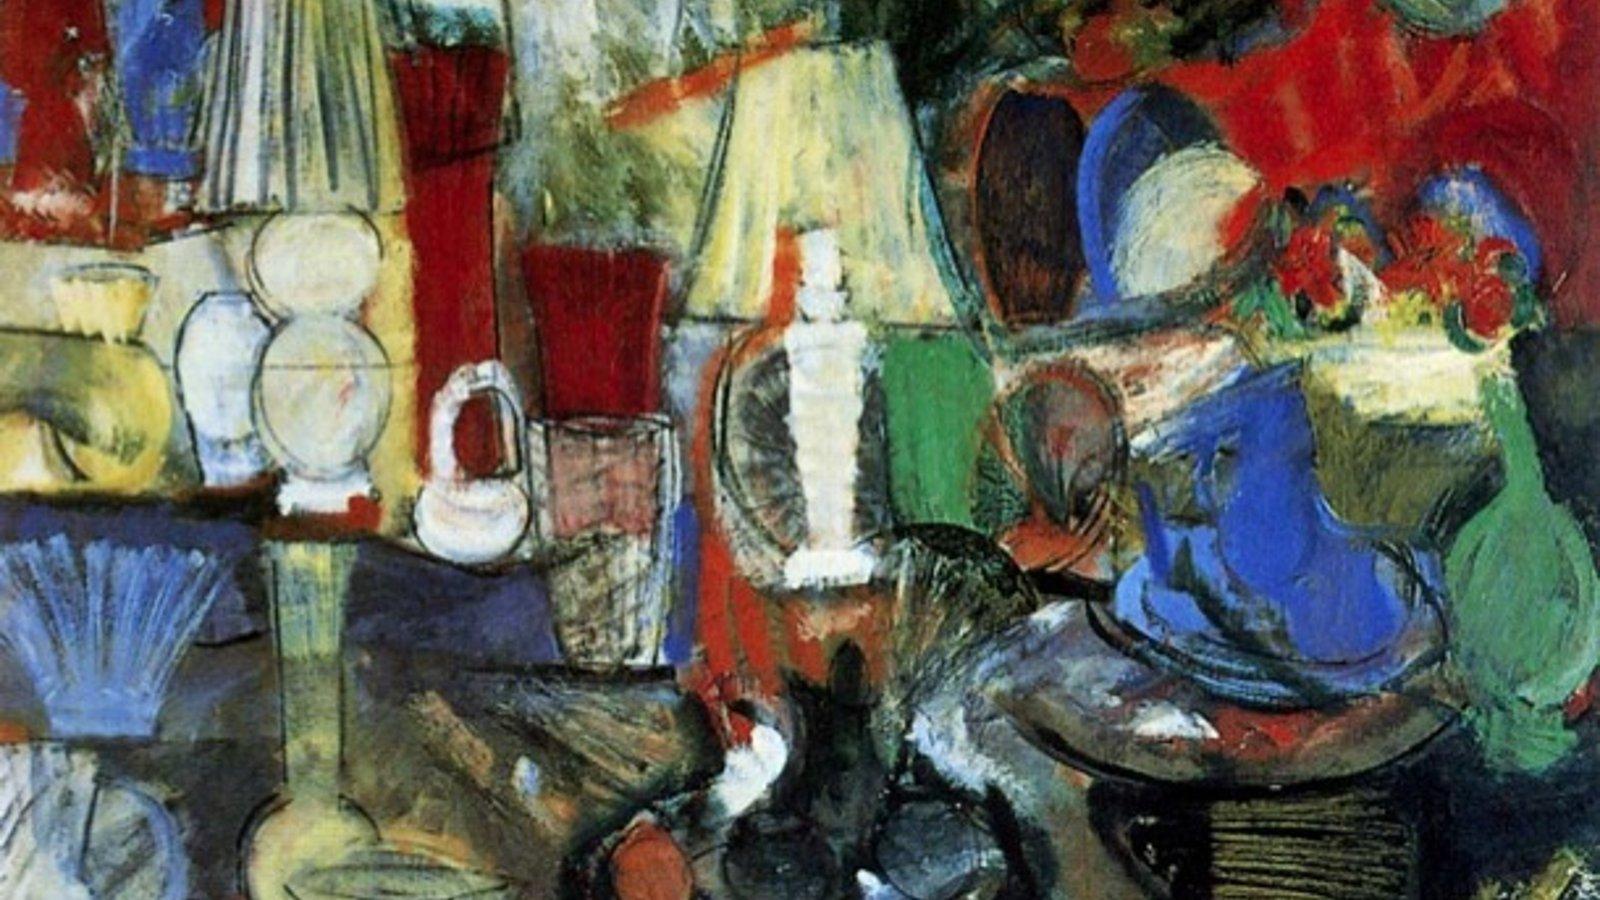 Grace Hartigan - Portrait of an Abstract Painter